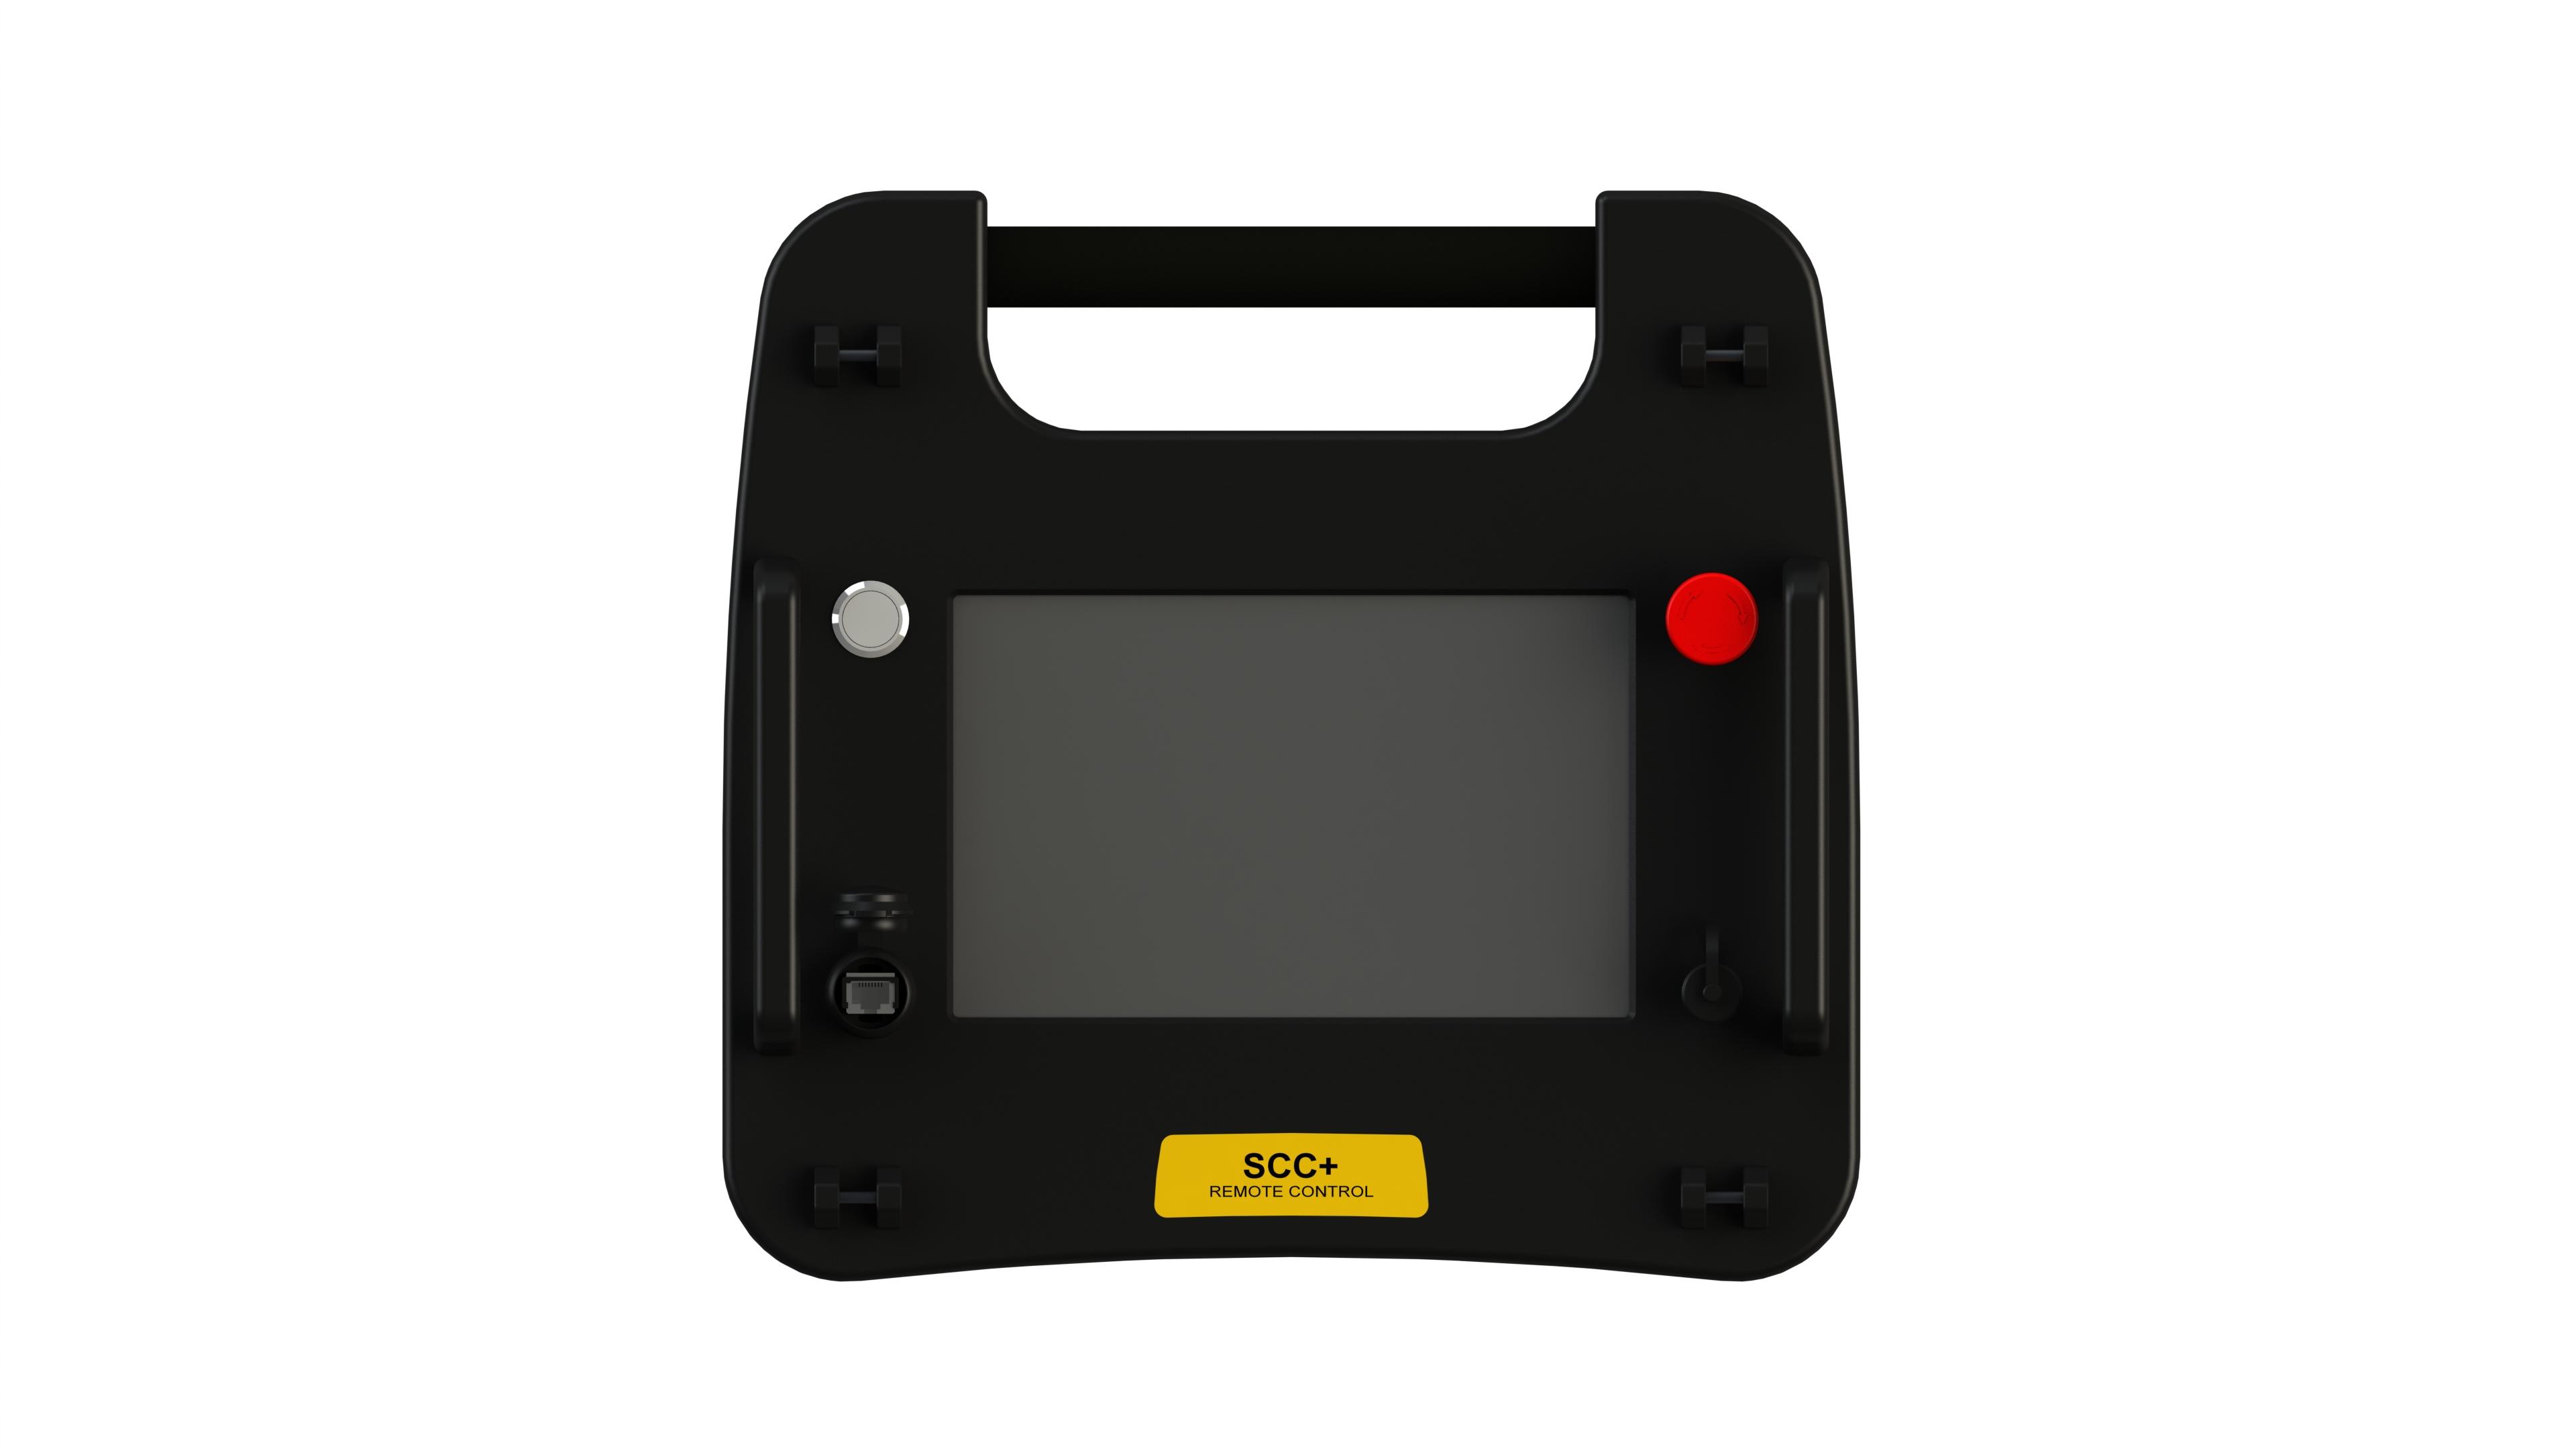 SCC+ front Remote control